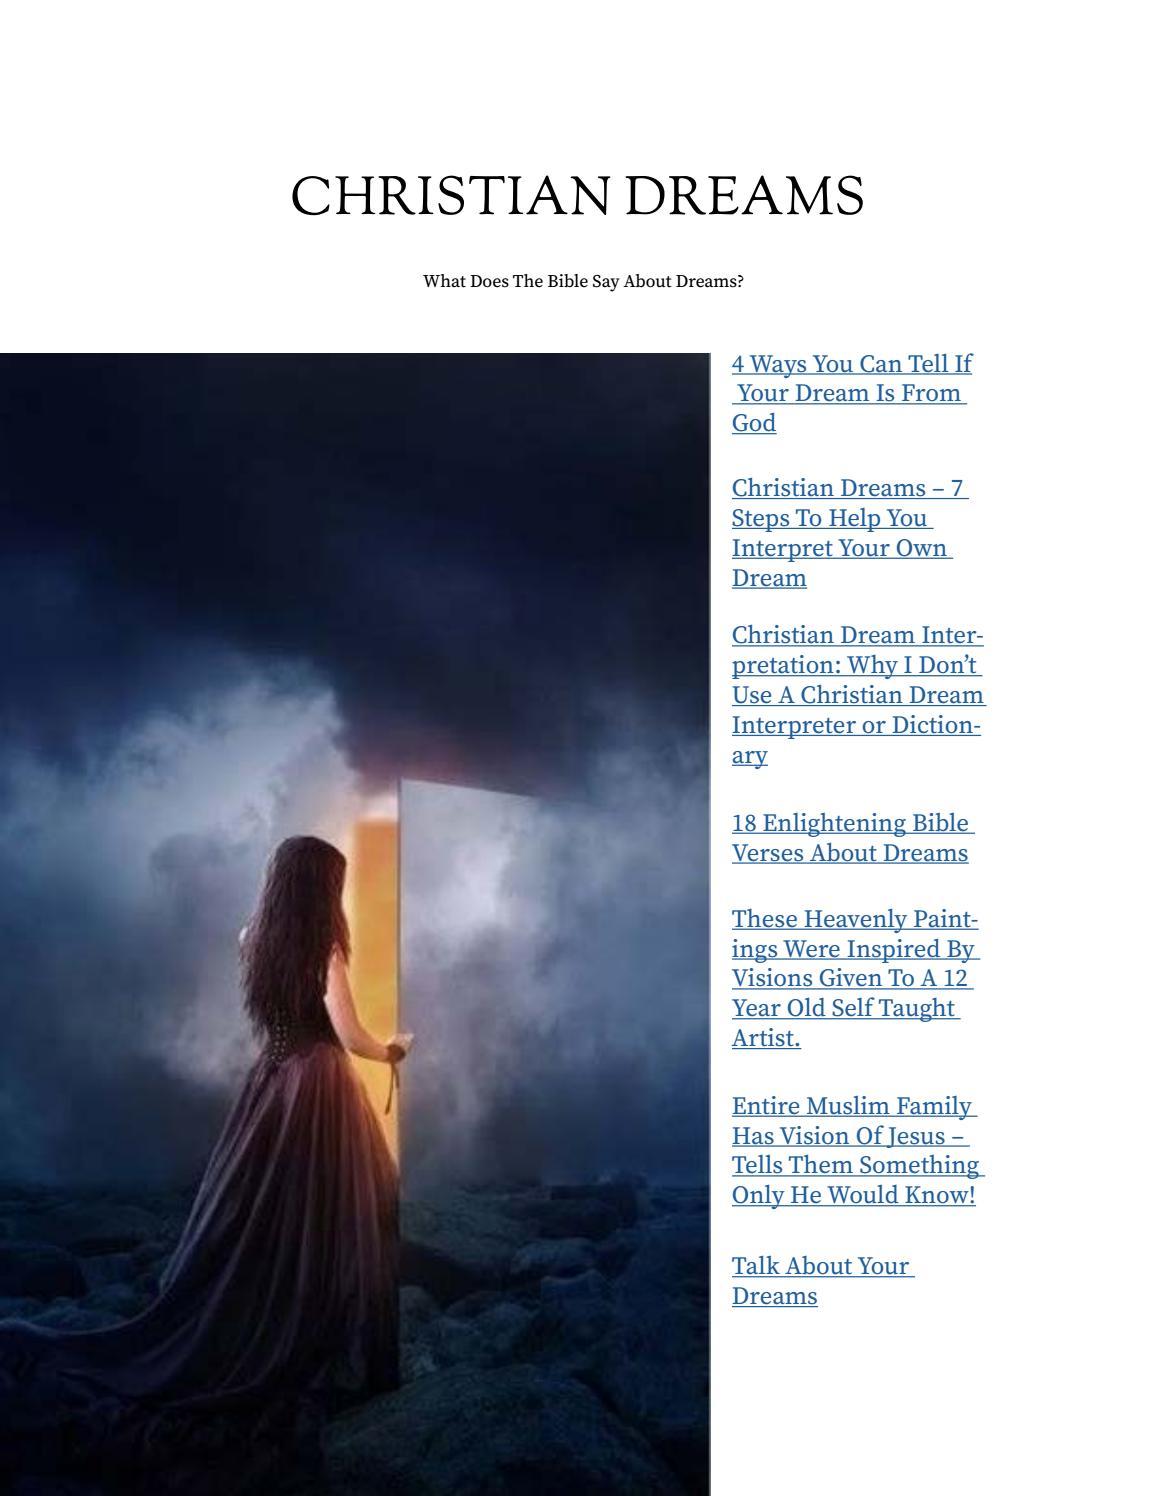 Christian dreams by duke taber issuu biocorpaavc Gallery